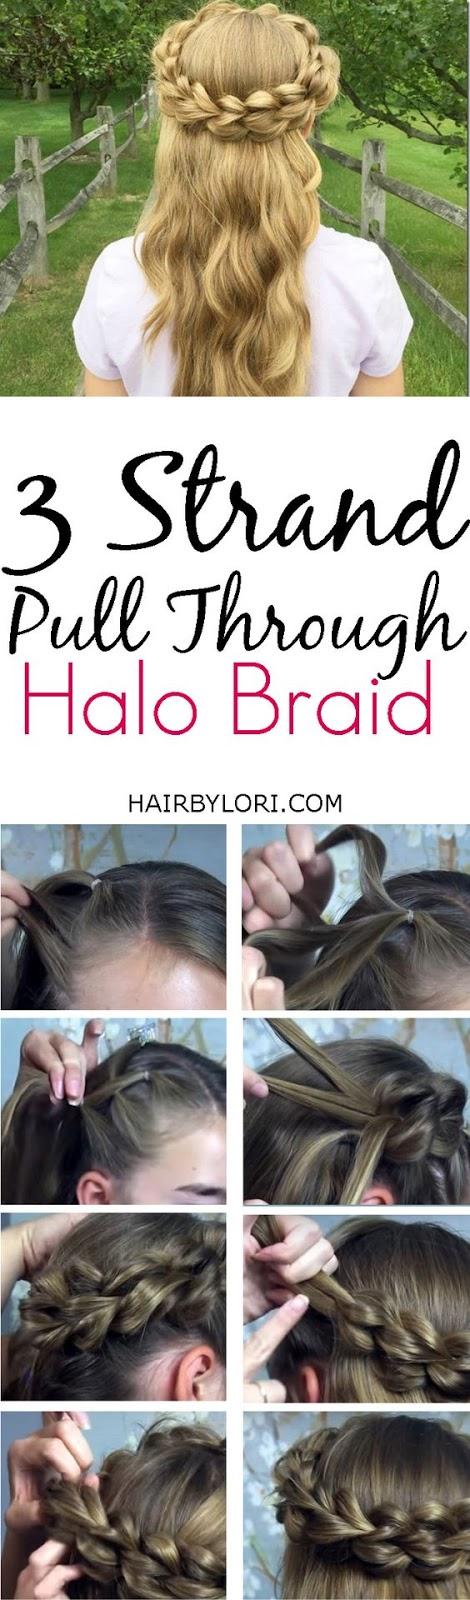 3 Strand Pull Through Halo Braid